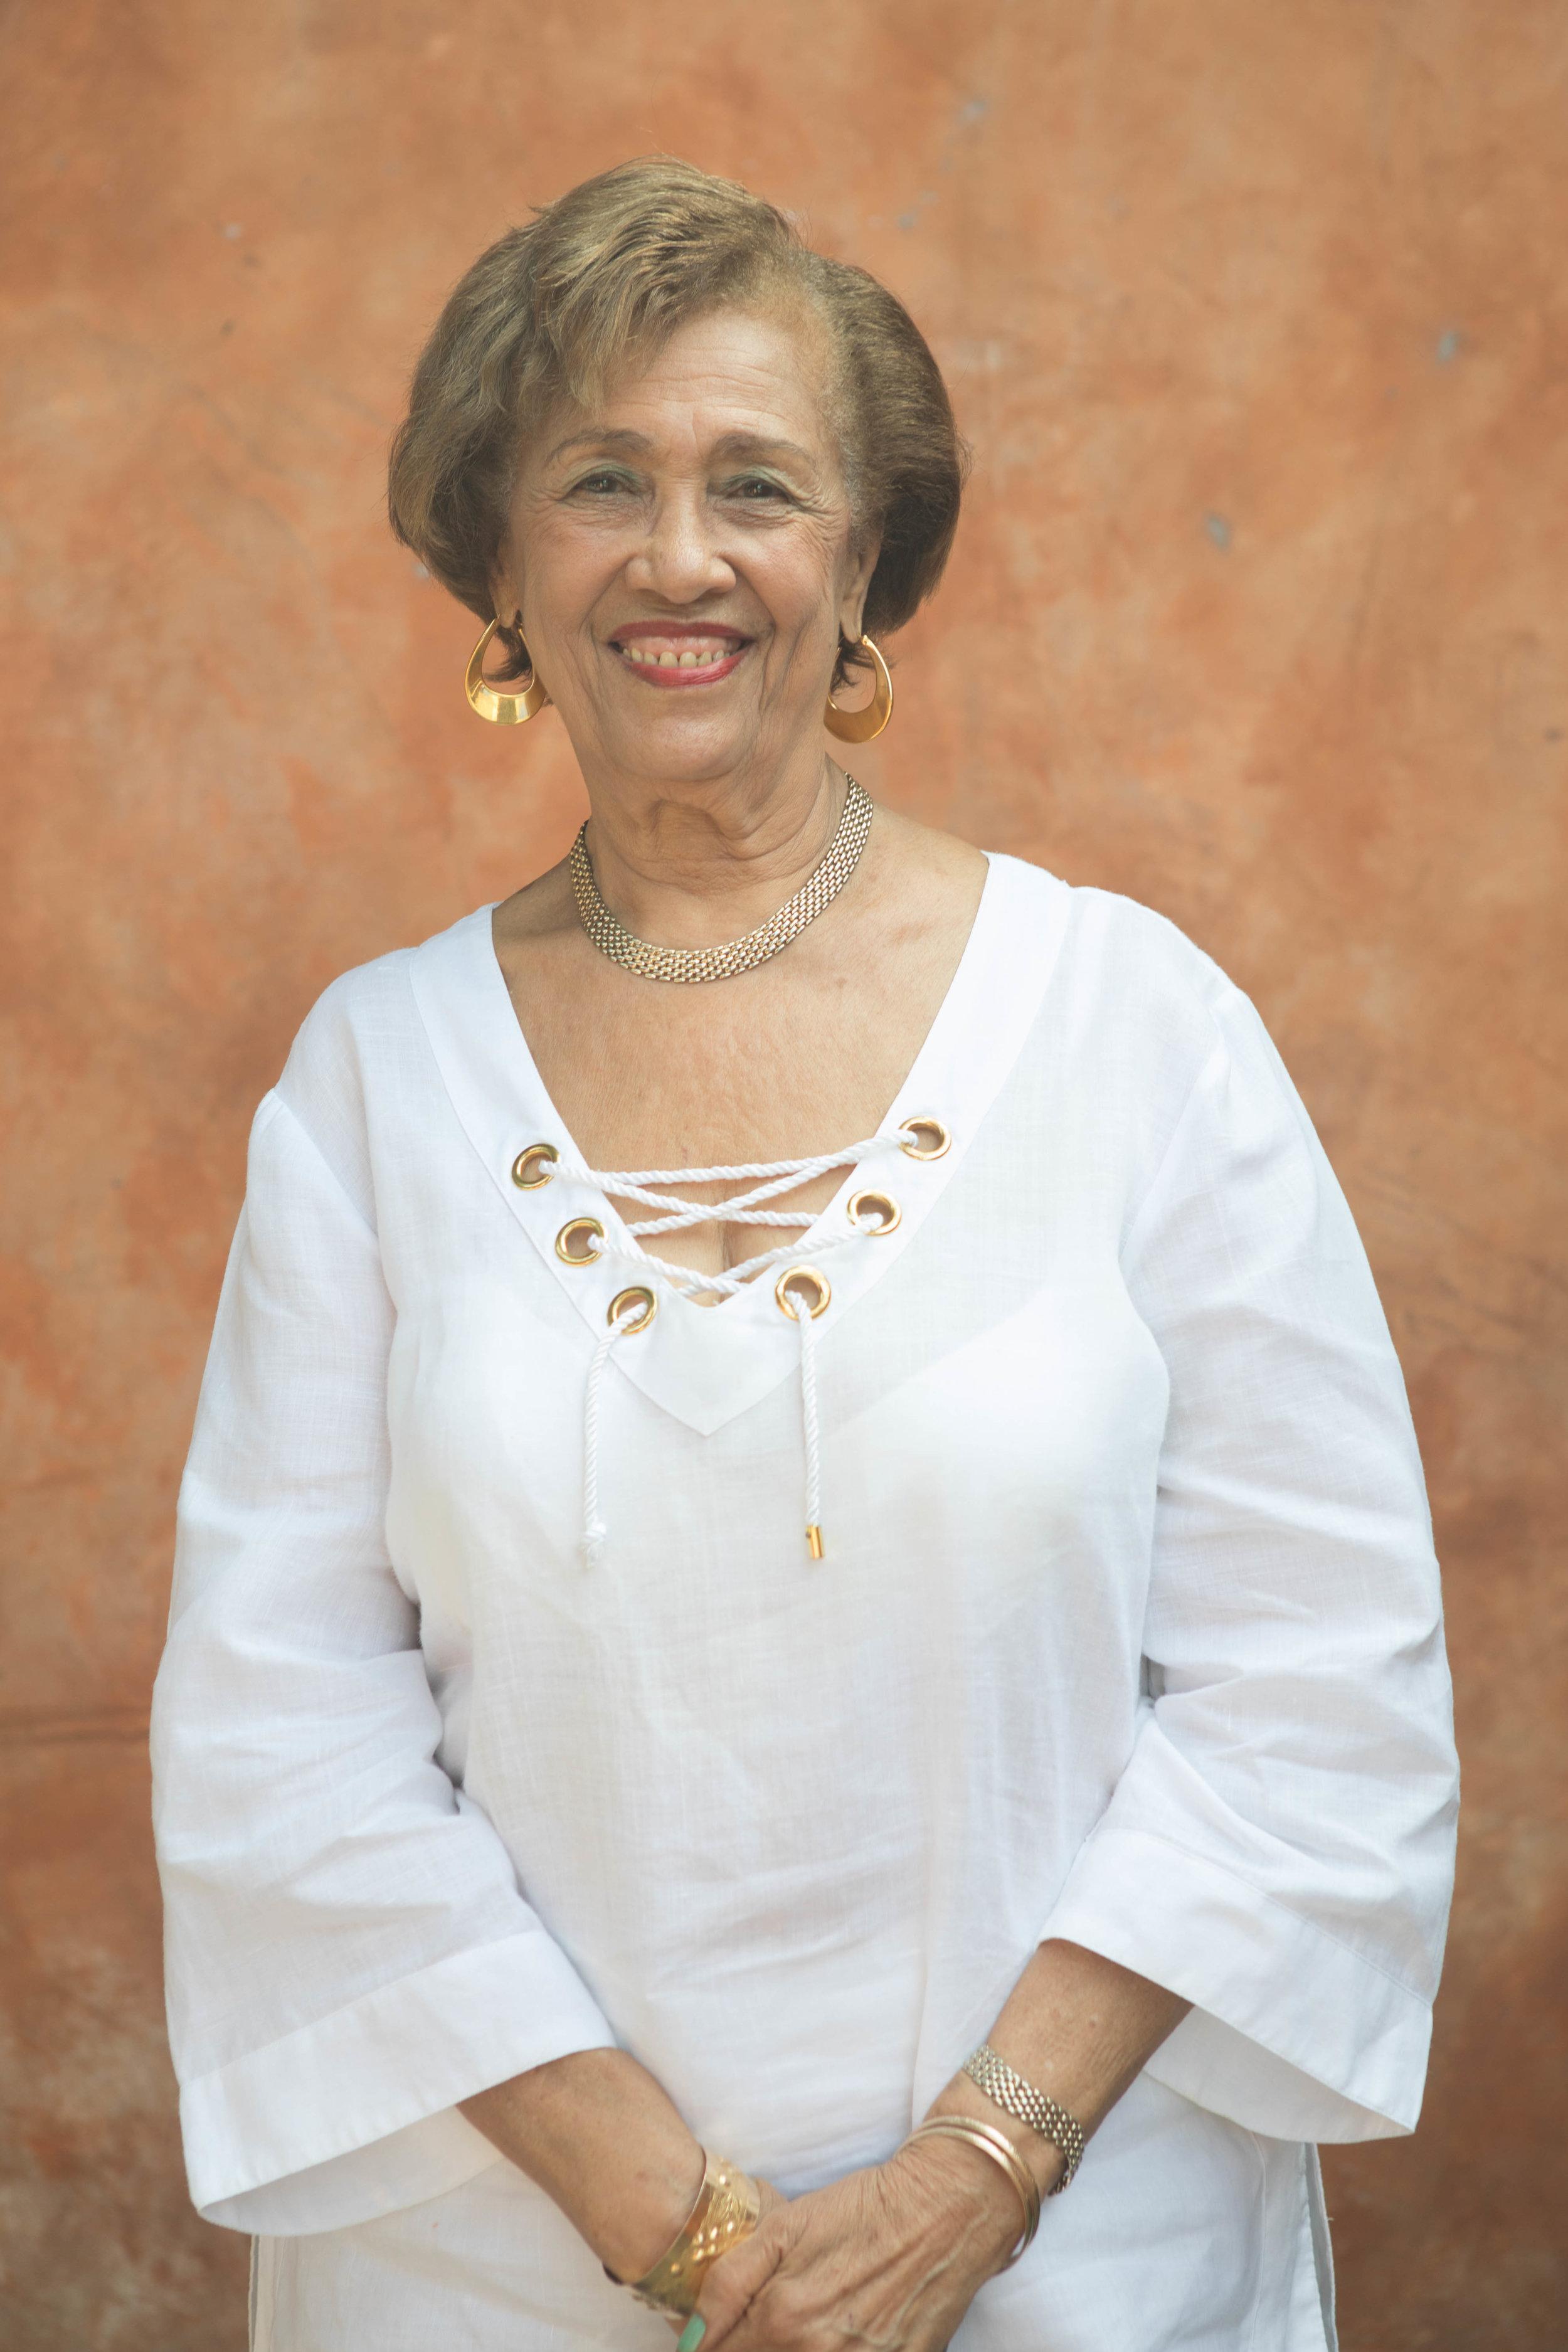 Dr. Marion Pierre, Executive Director of the Queen Elizabeth Home